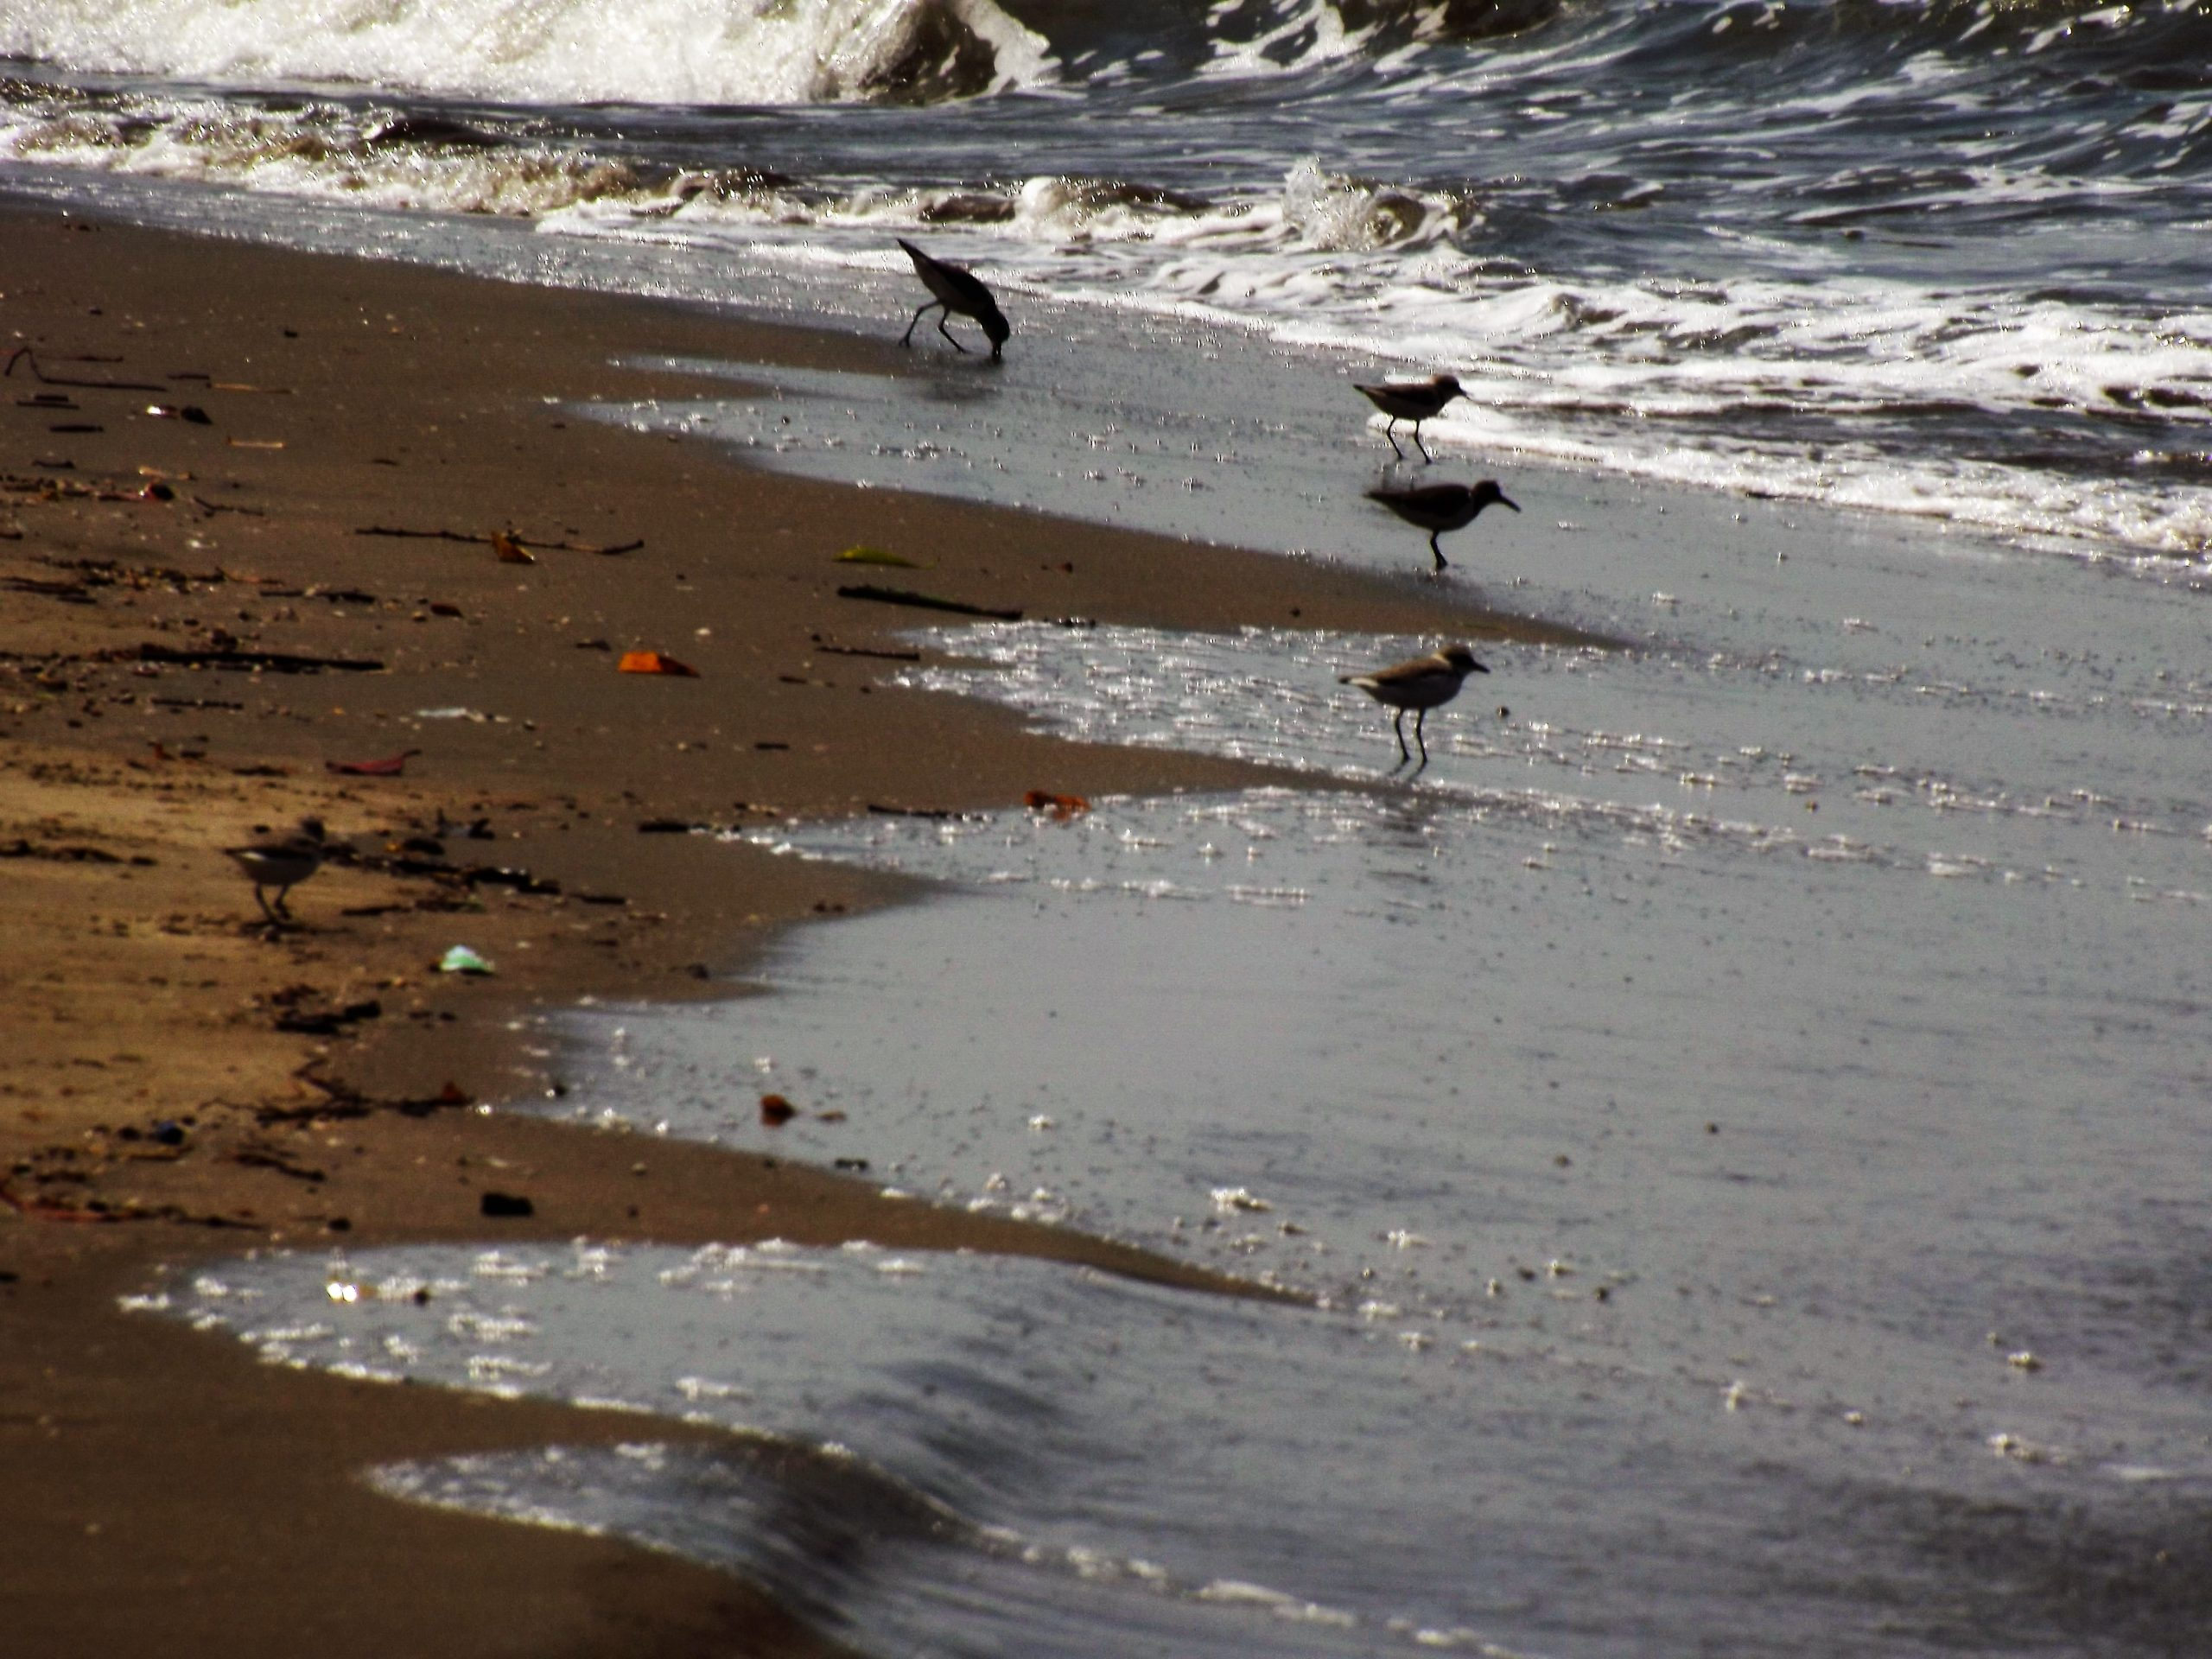 Crows at a beach in Goa